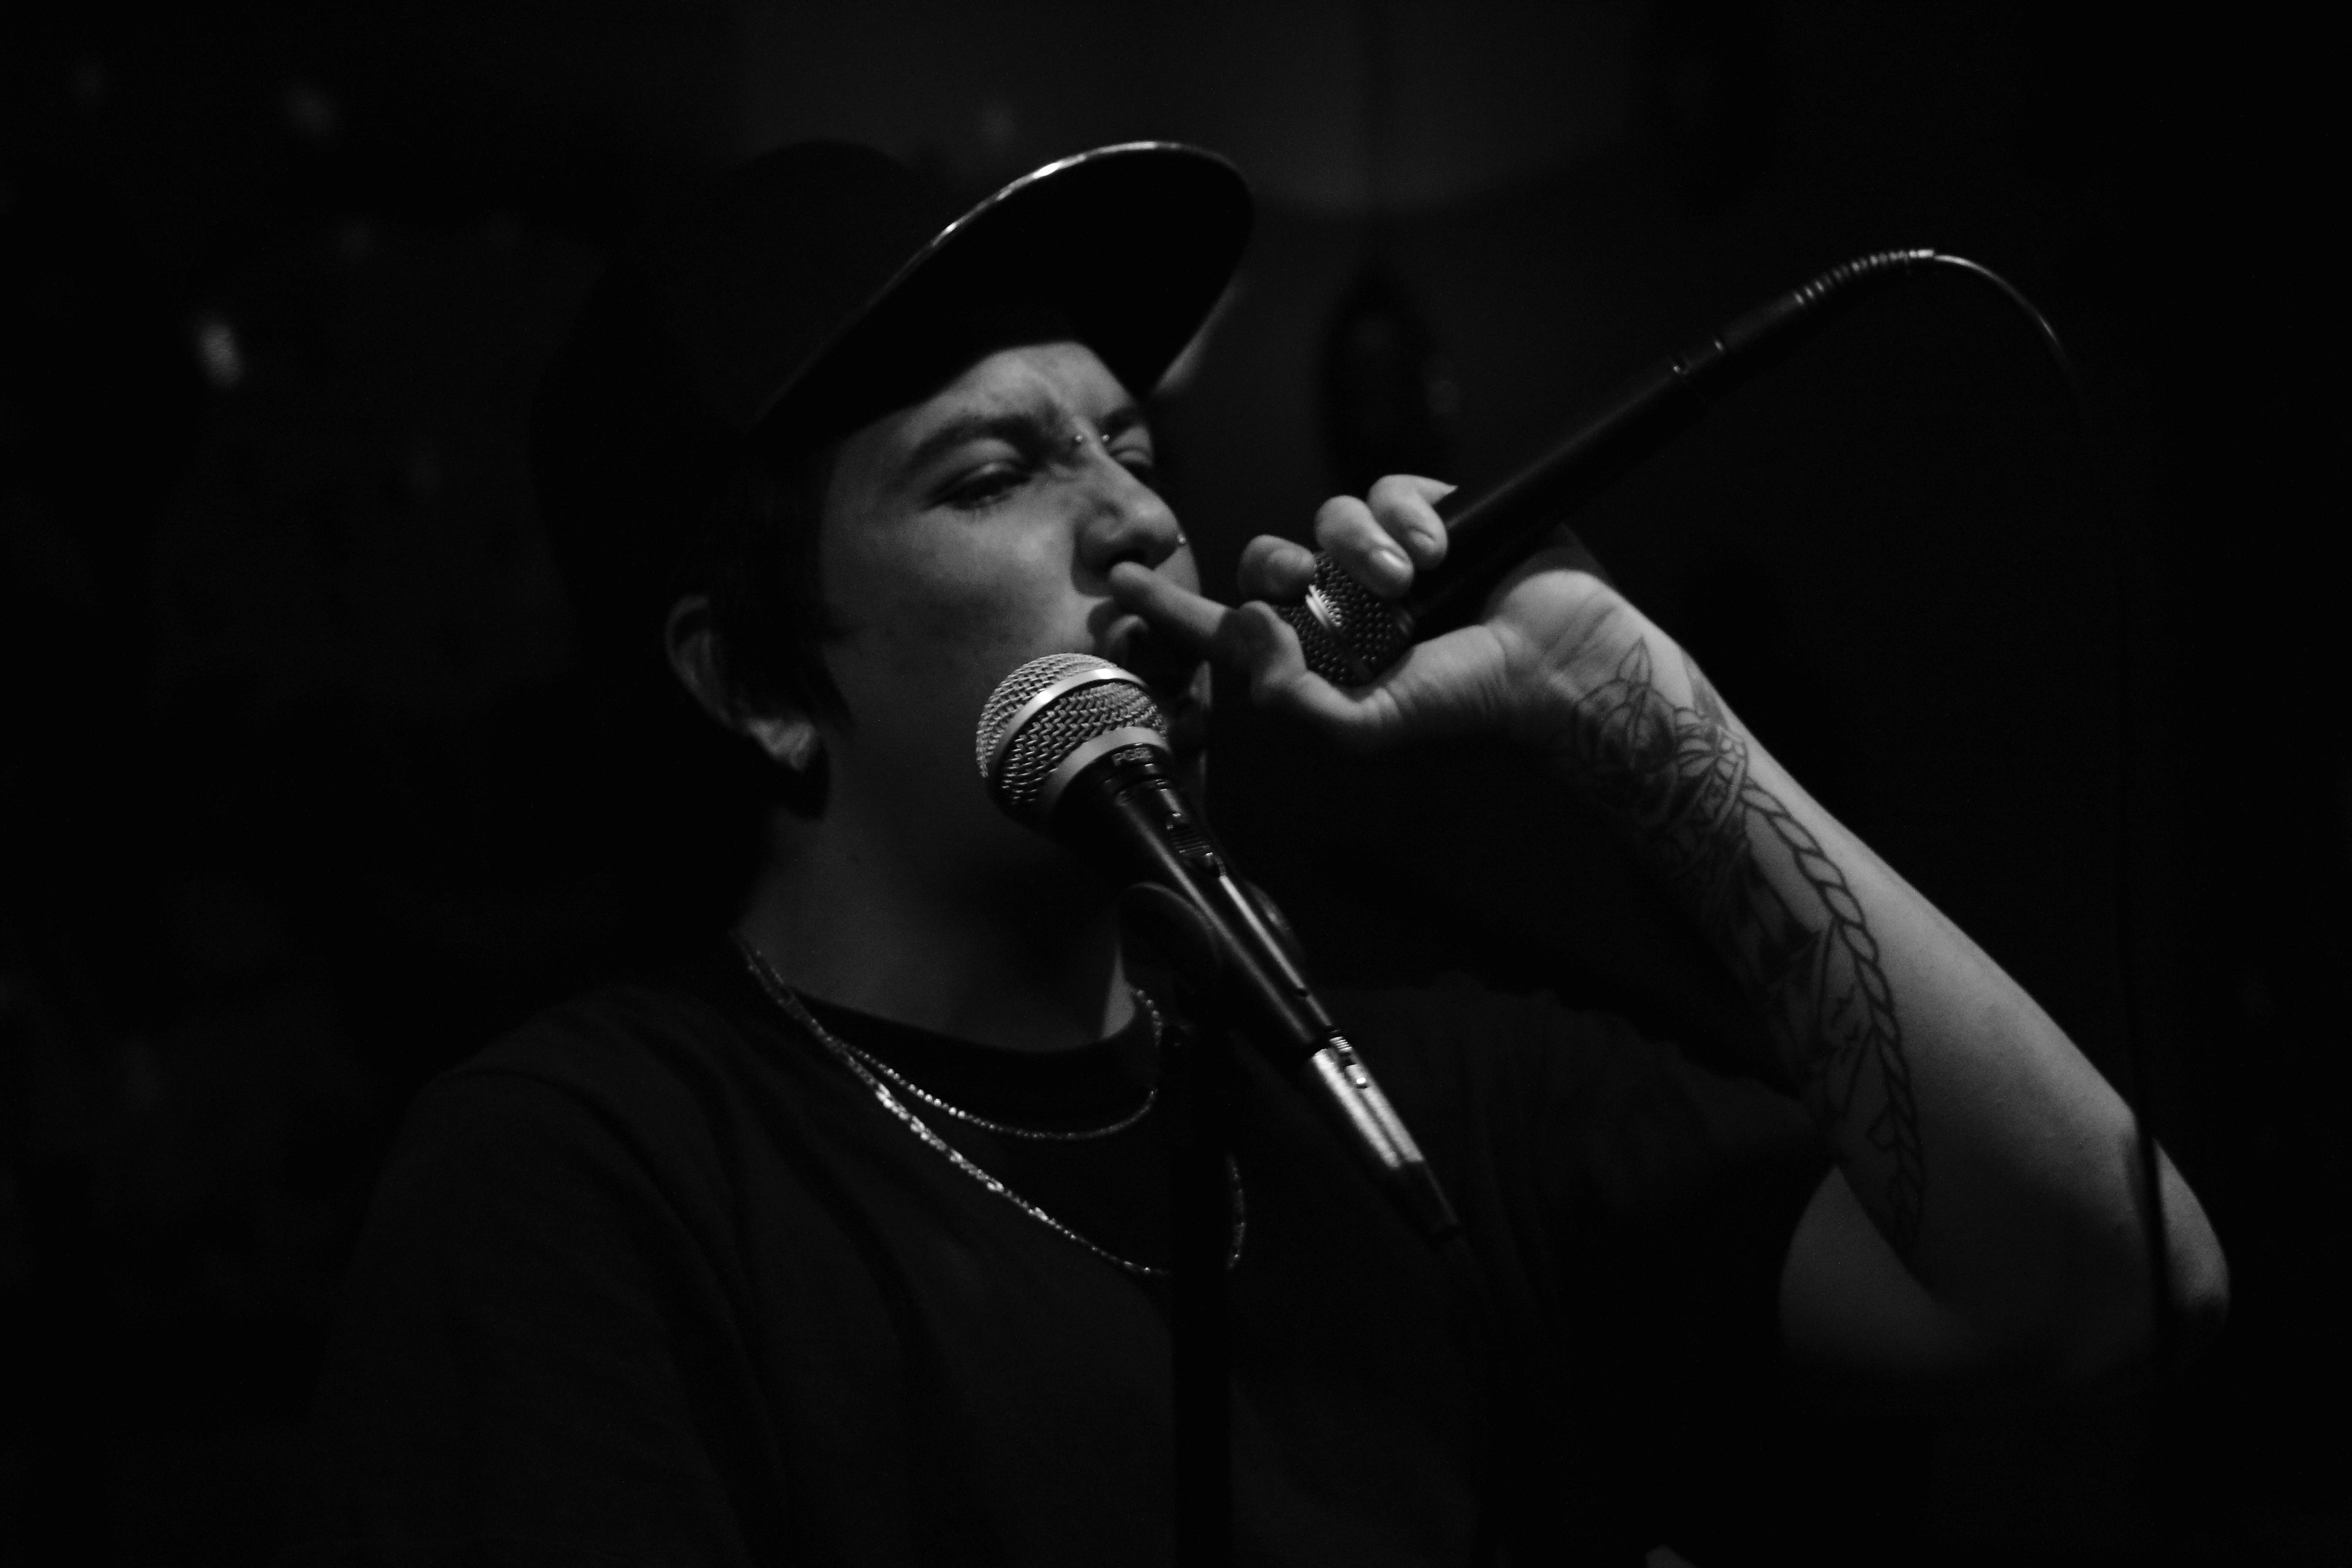 File:Cantando Hip Hop.JPG - Wikimedia Commons Cantando